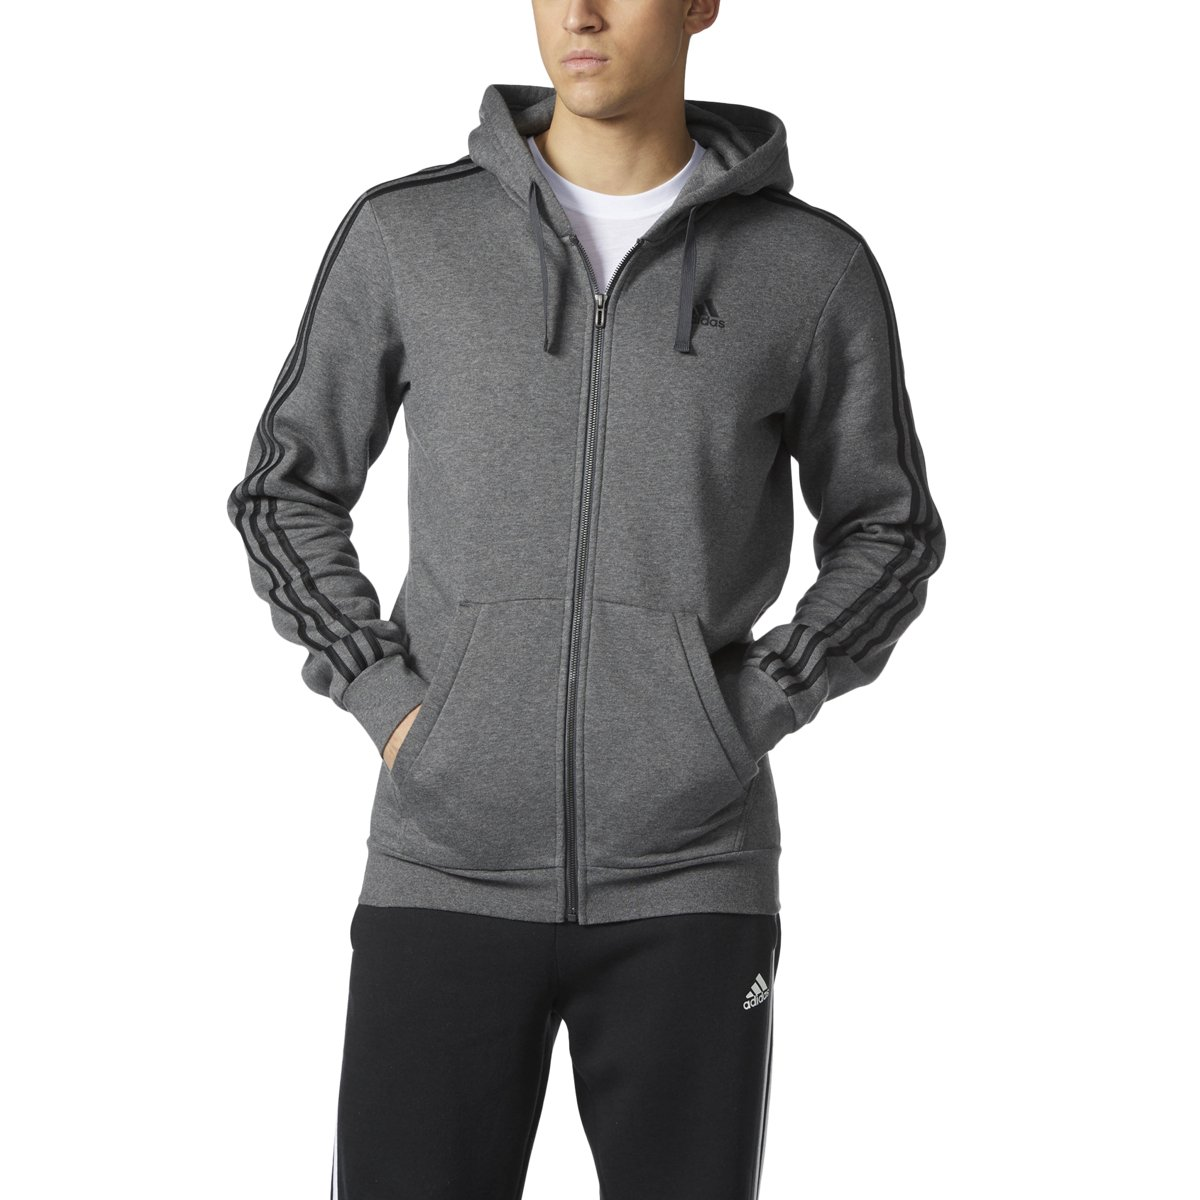 adidas Men's Athletics Essential Cotton 3 Stripe Full Zip Hoody, Dark Grey Heather/Black, 4X-Large